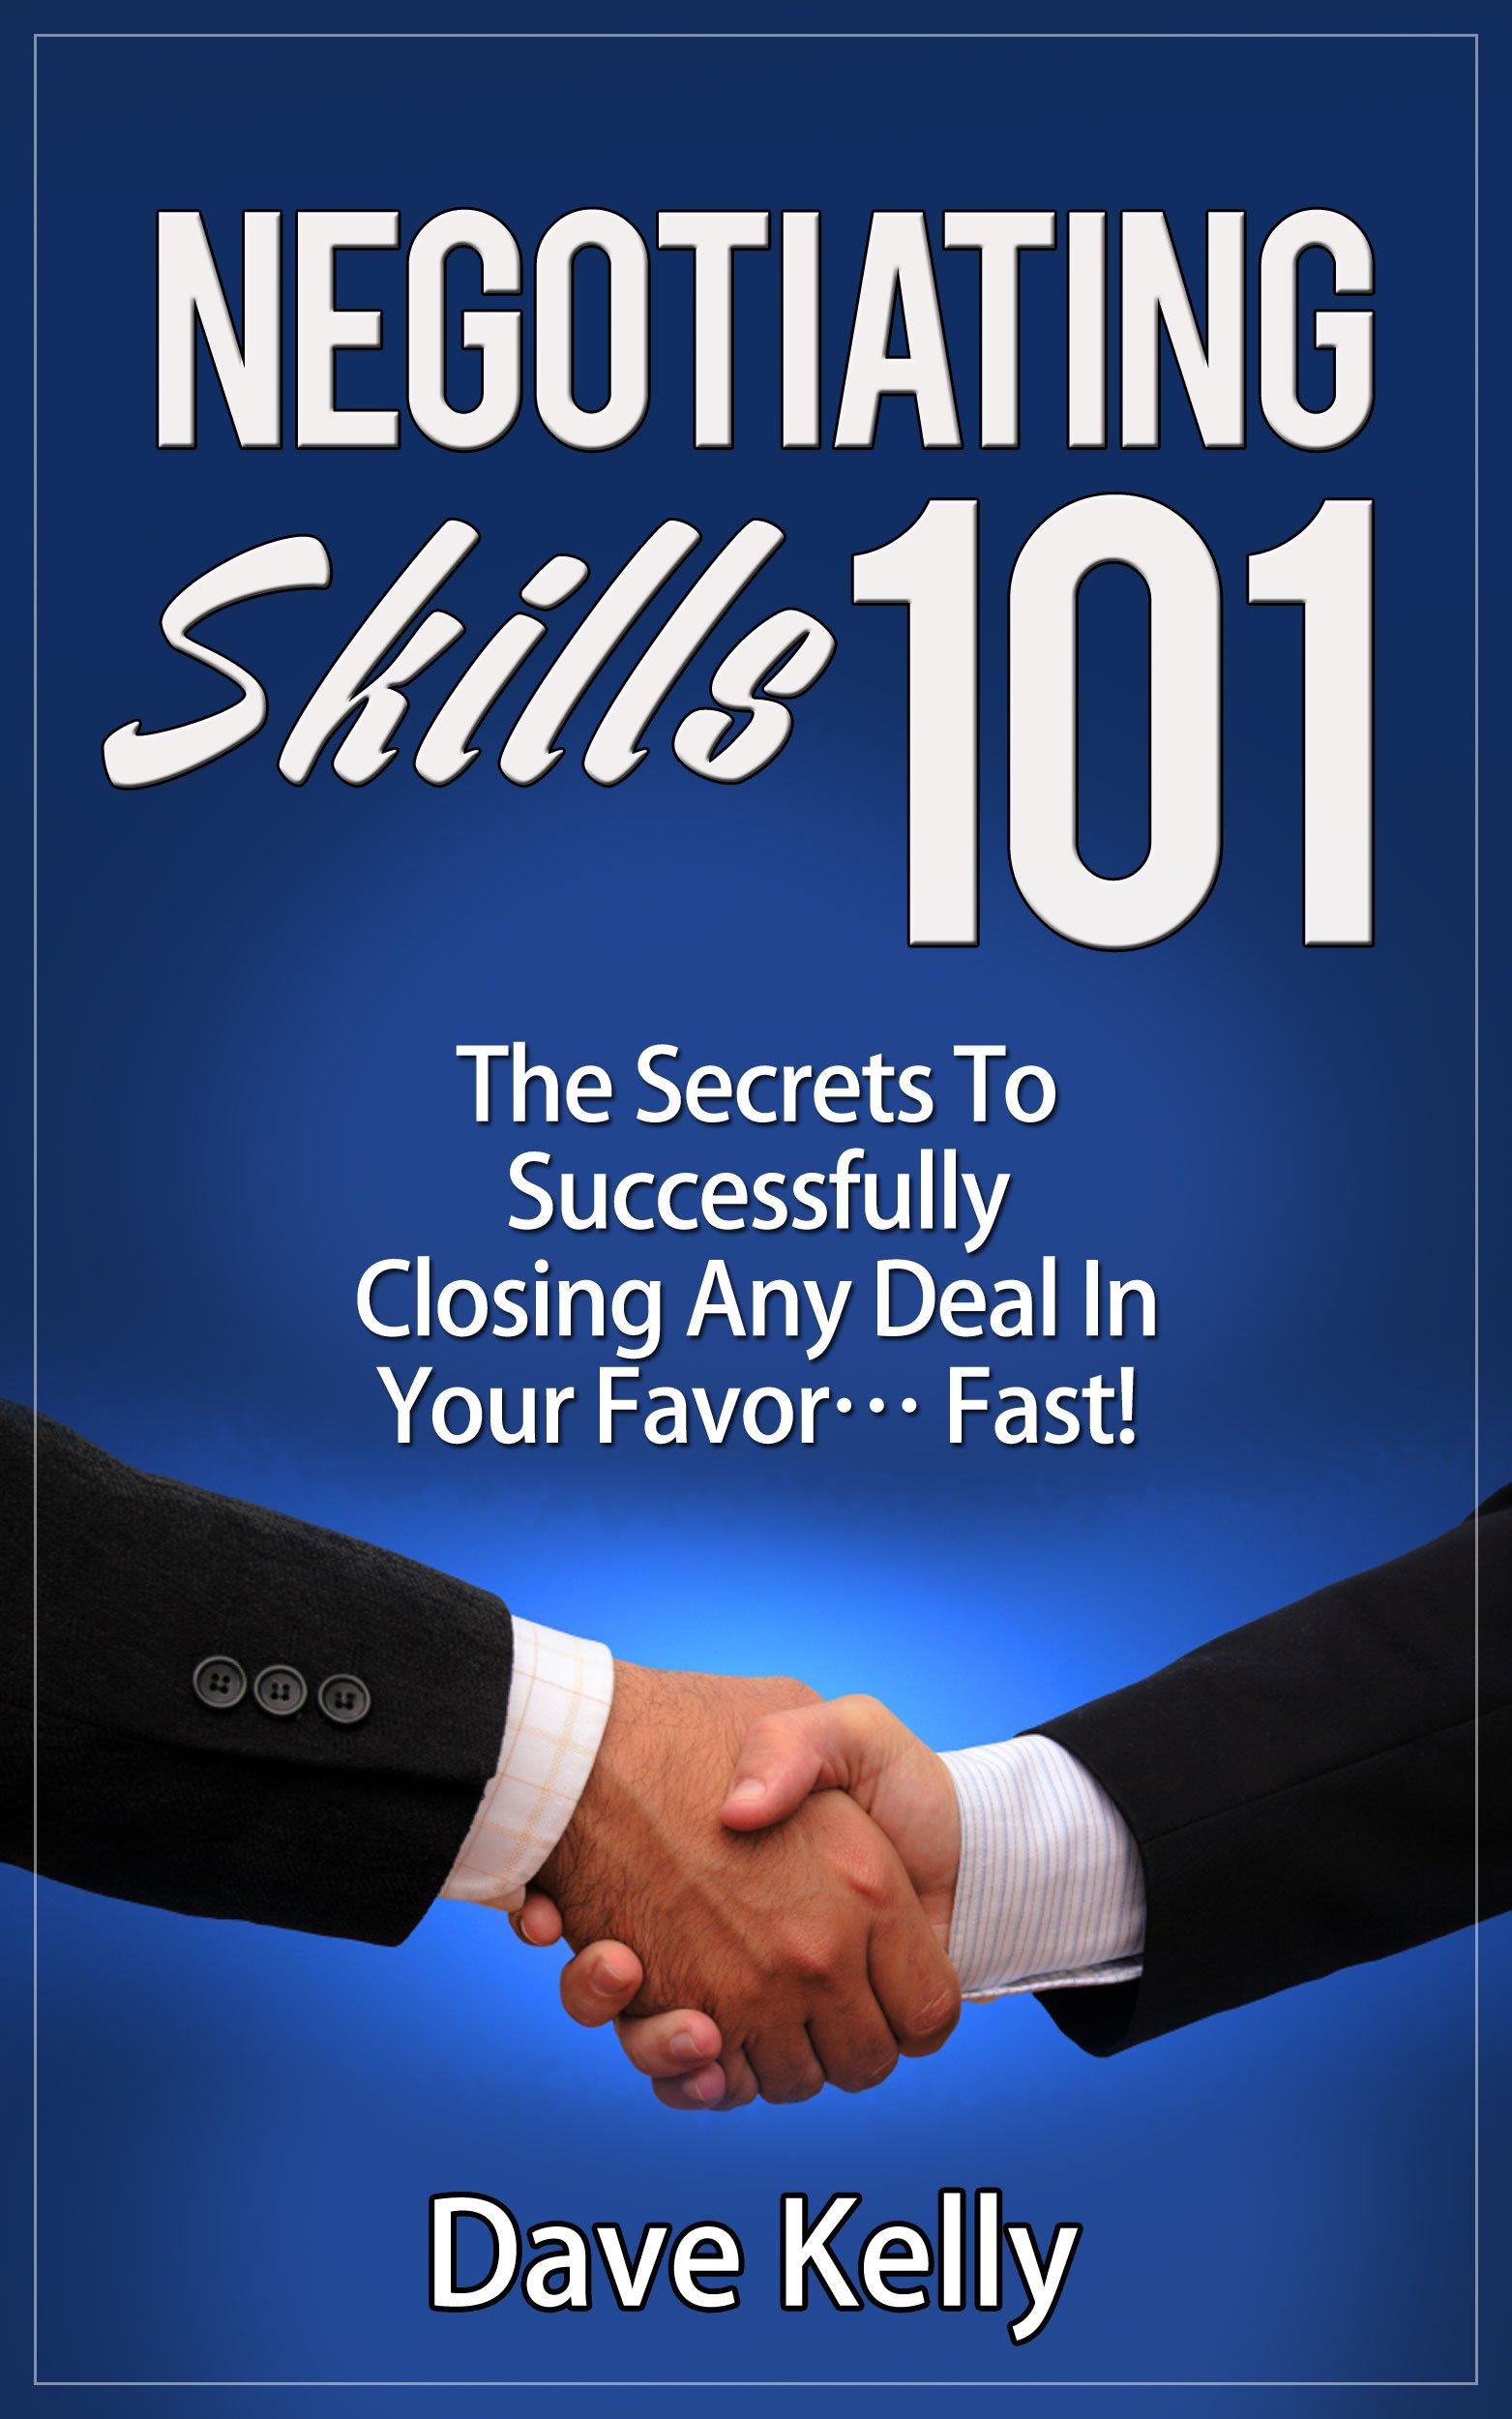 Negotiating Skills 101 - Successfully Close Any Deal